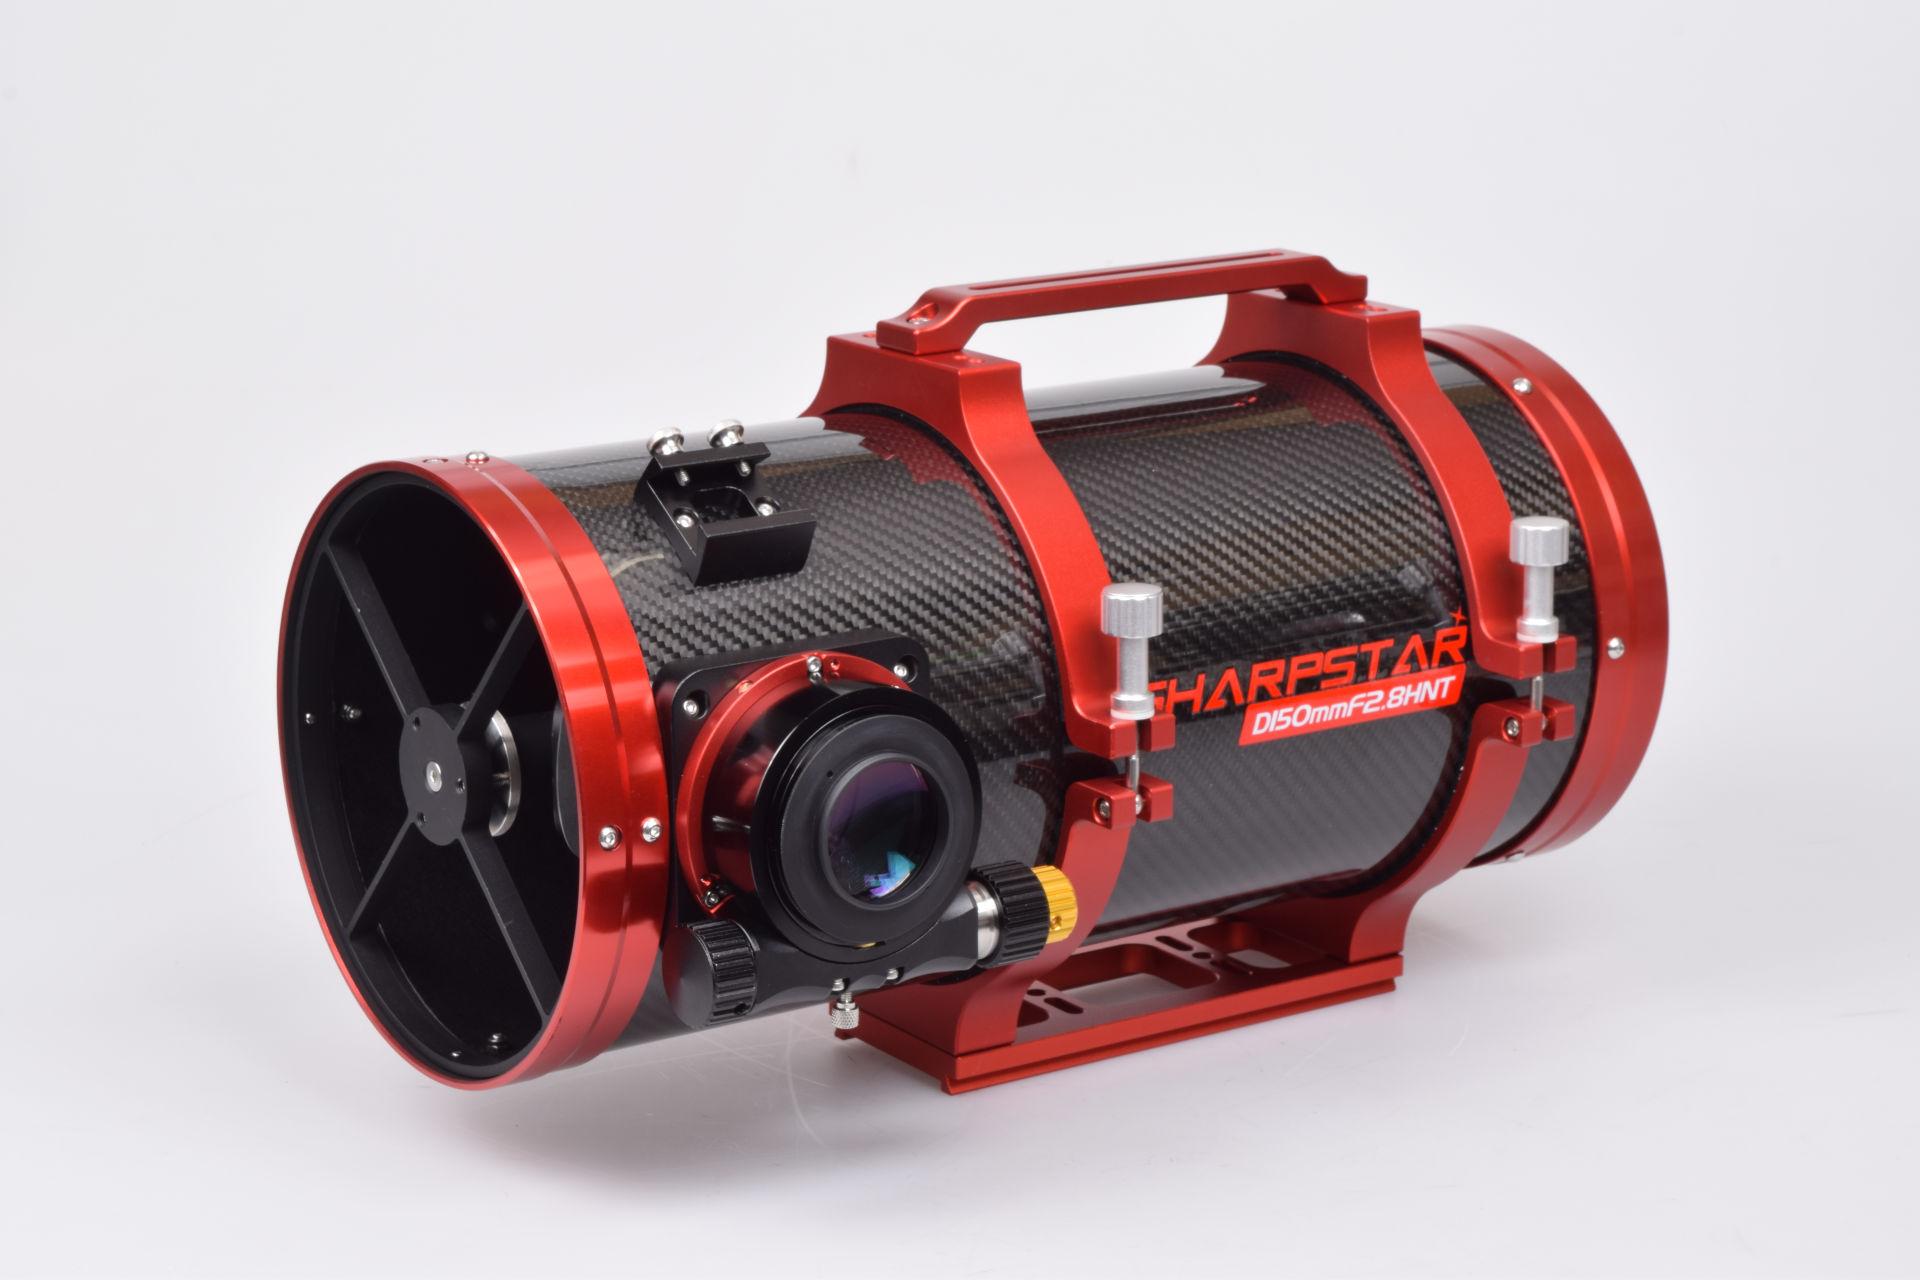 SHARPSTAR 15028HNT 鏡筒